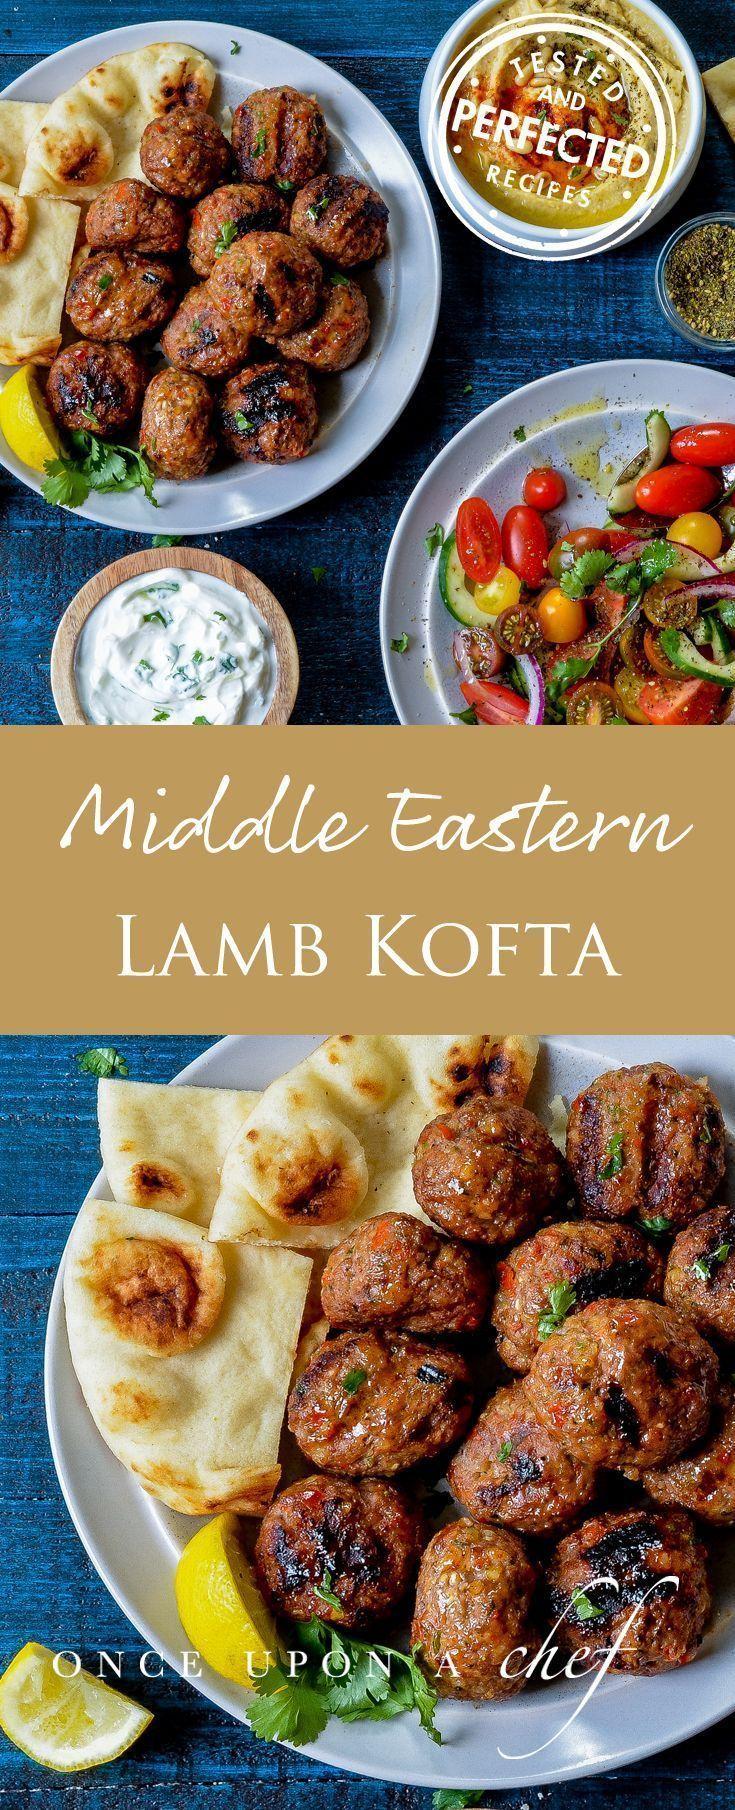 Middle Eastern Lamb Kofta